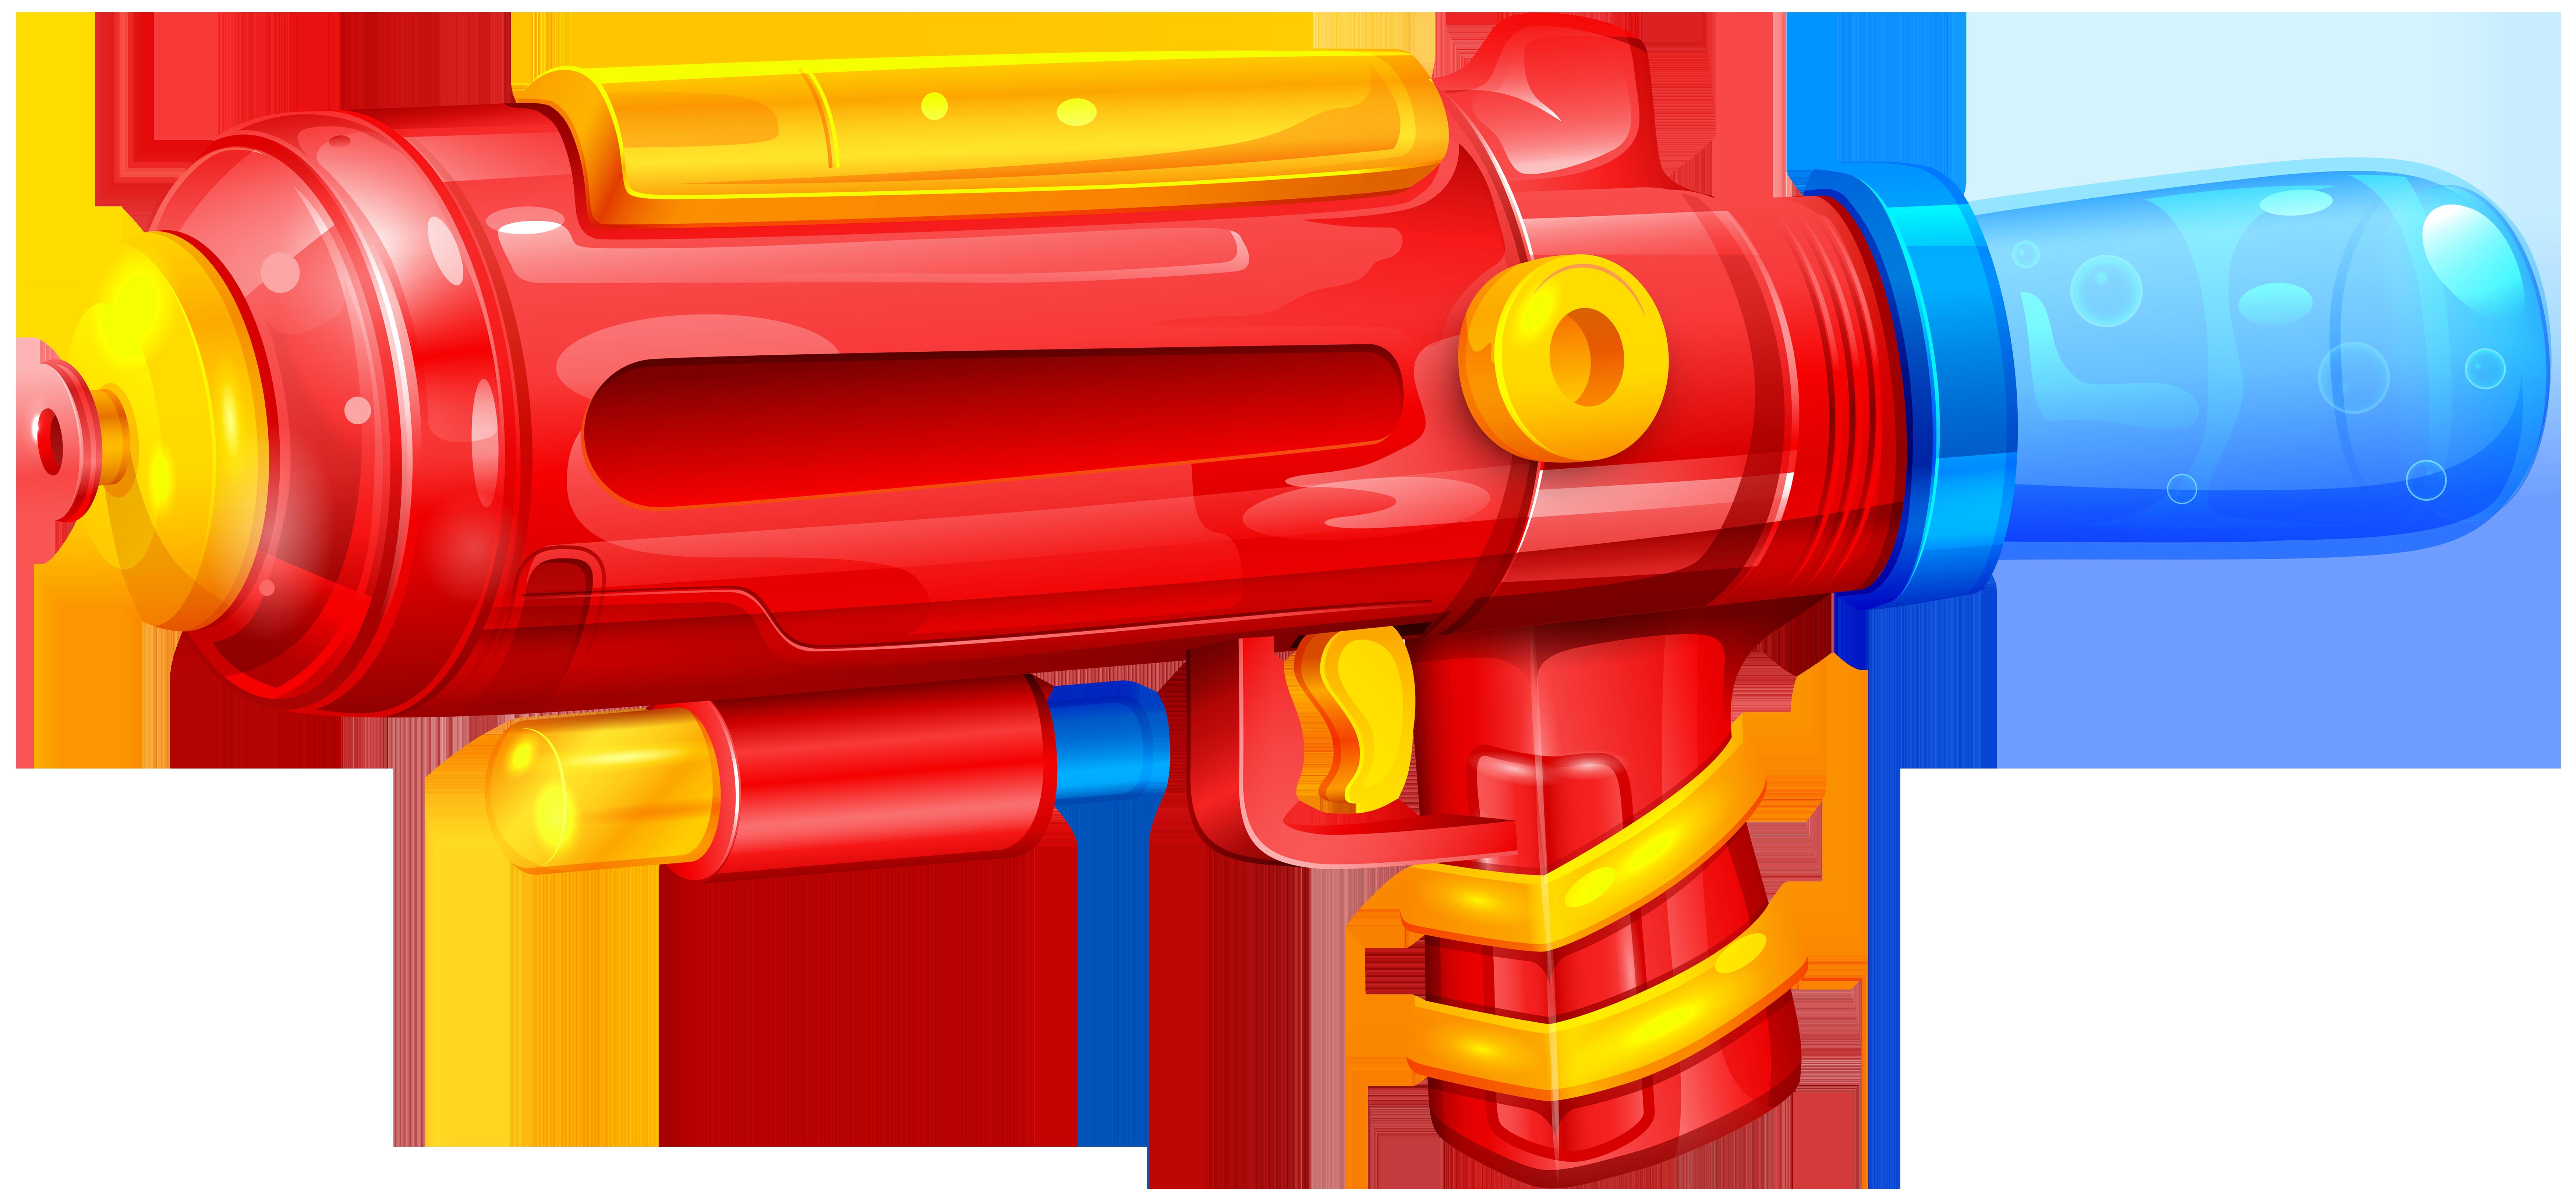 Water Gun Png Clip Art Image Transparent Free Download - Water Gun, Transparent background PNG HD thumbnail